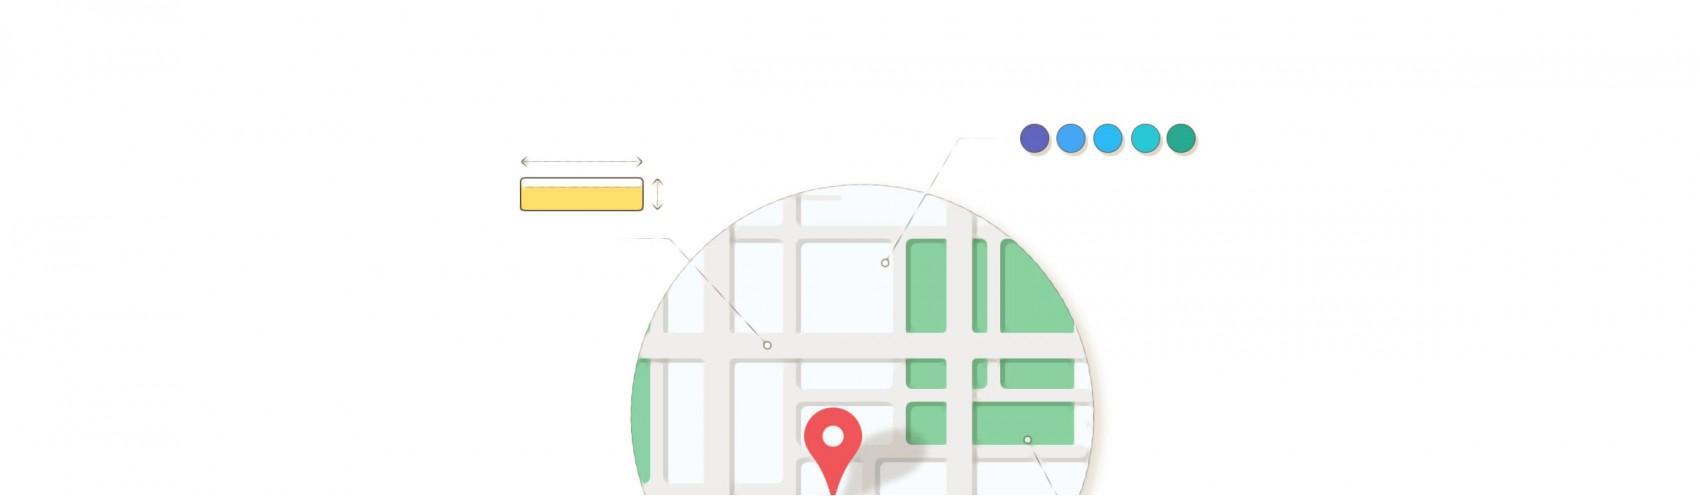 Google Map Styler on twitter widget, google launcher, google phone app, google aosp, google code, google icon, google pdf, google buttons, google media, news widget, google spdy, google post, google chromecast station, google links, google gadgets, google social, google barrel, google games, google calendar, google market, events widget, google logo, bookmark widget, google application, google update,